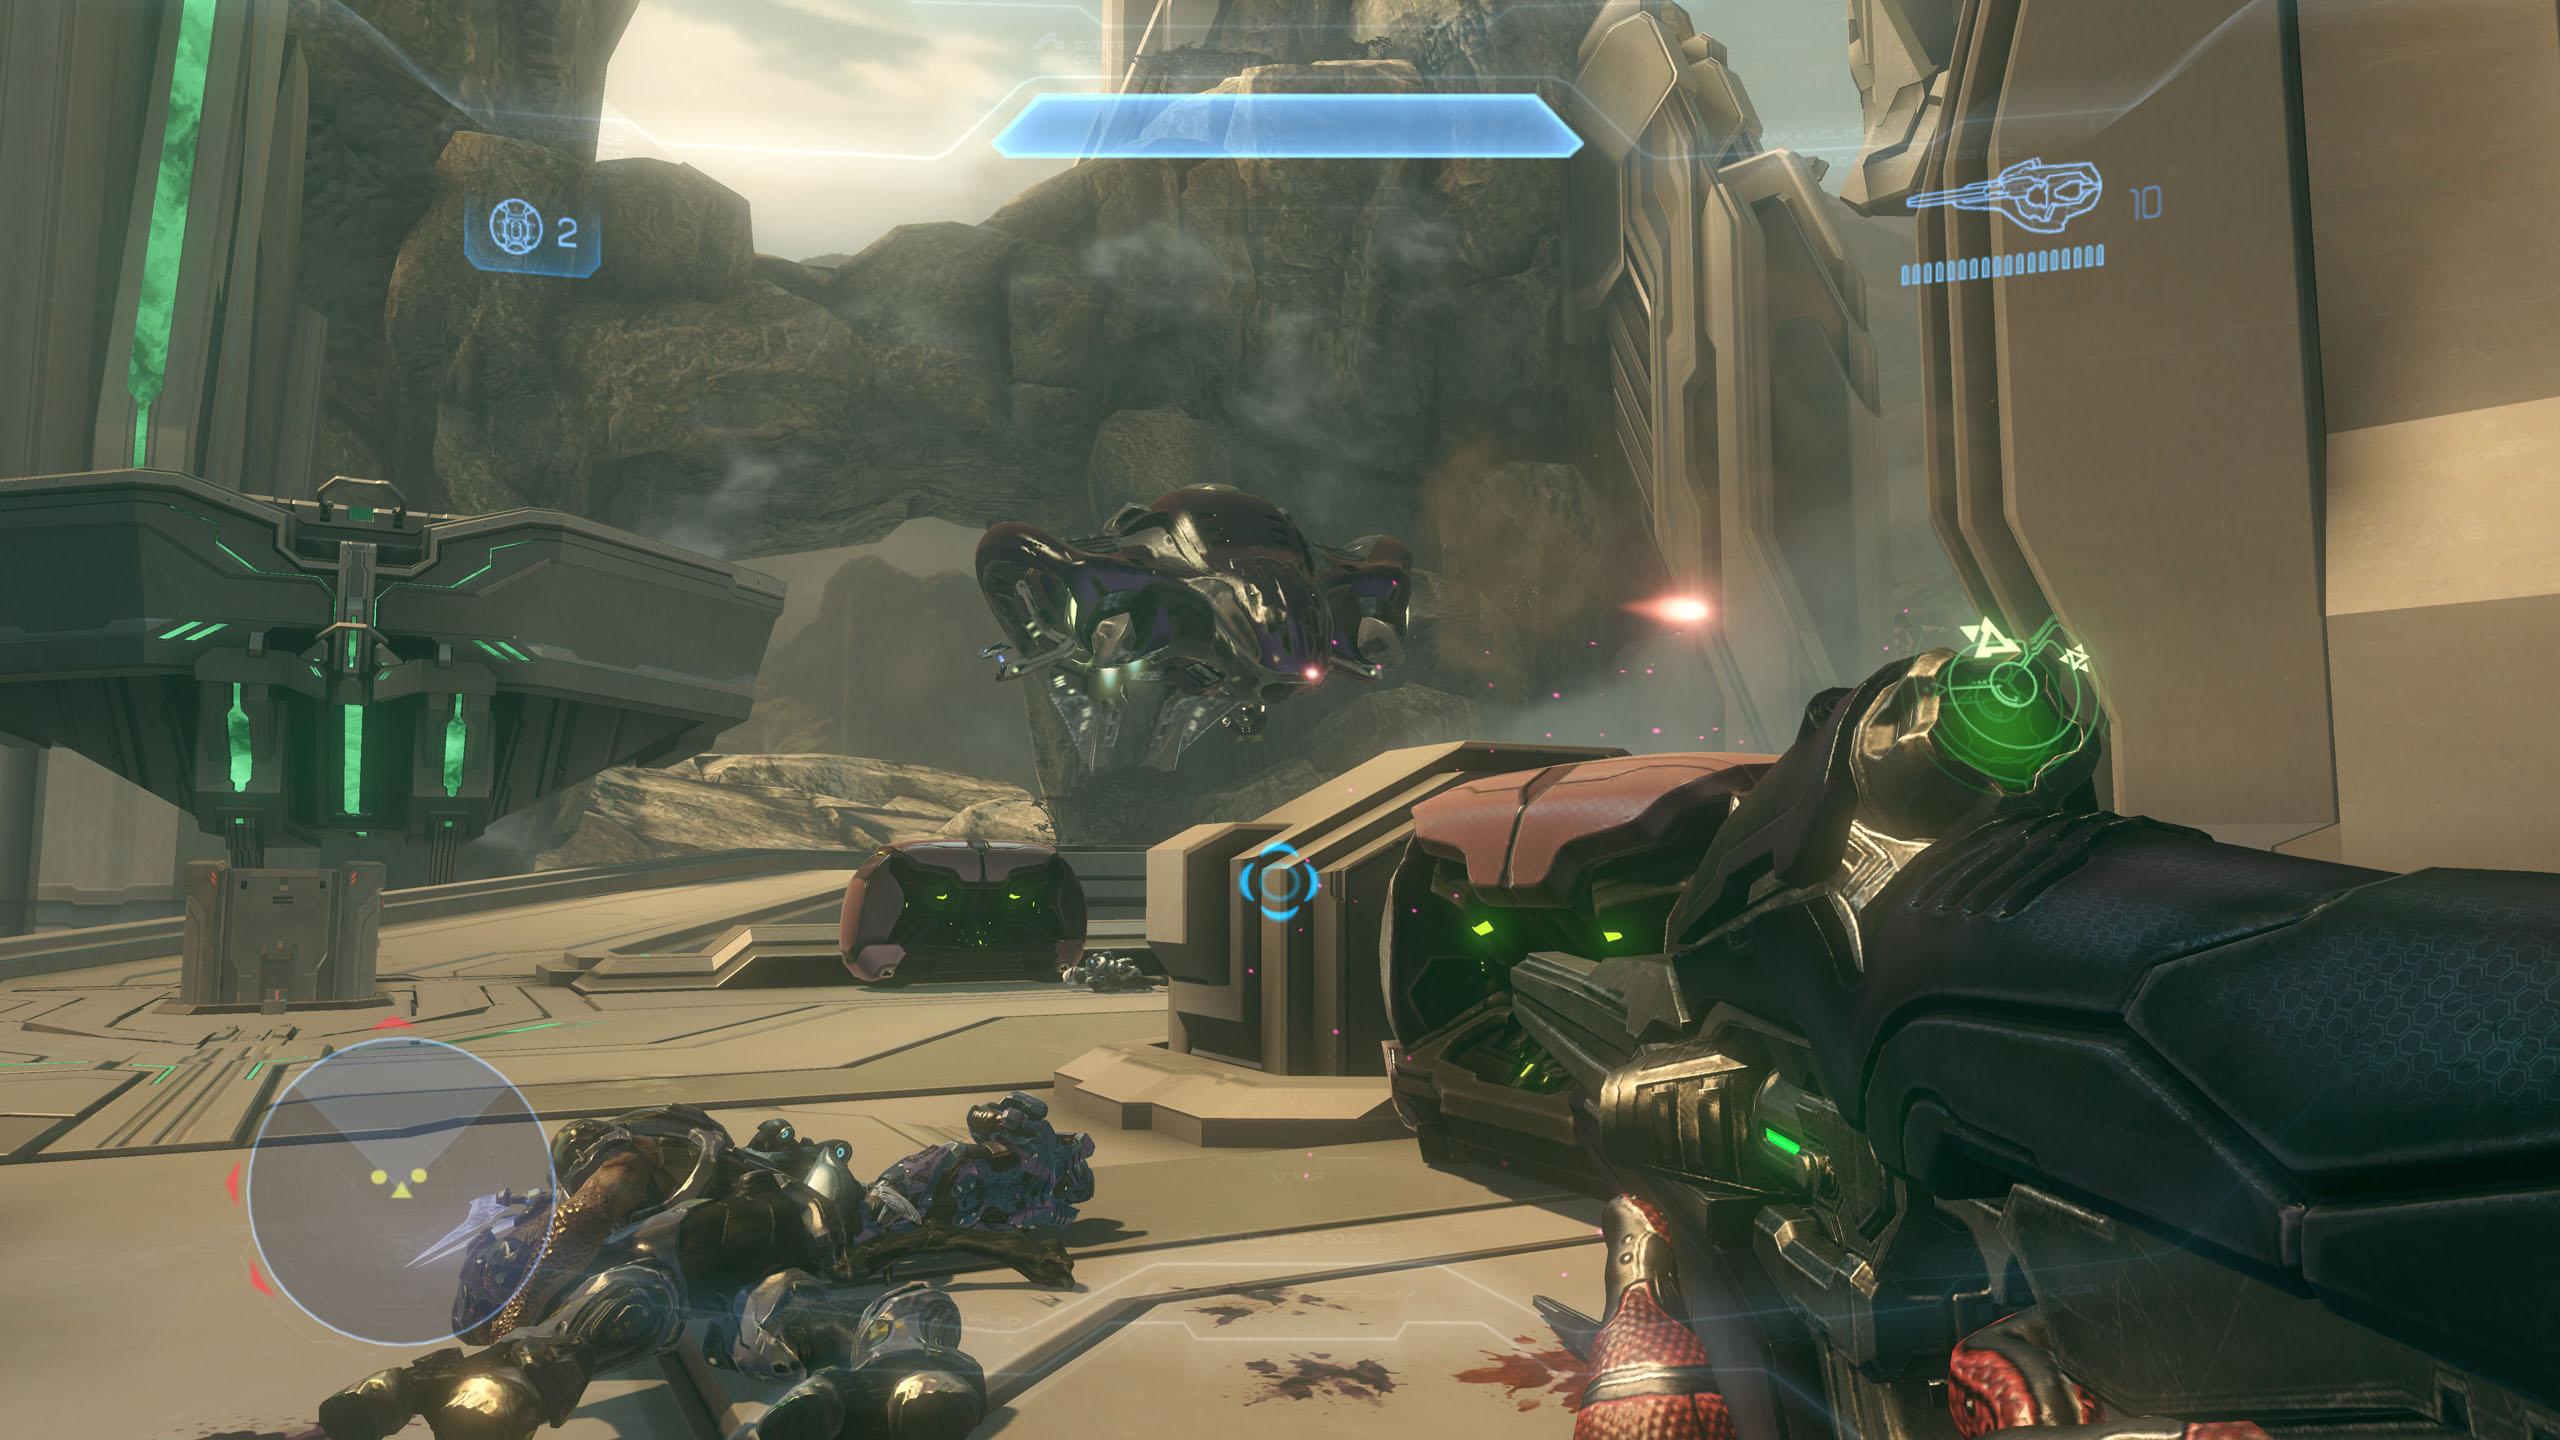 Halo 4 Spartan Ops Scr...